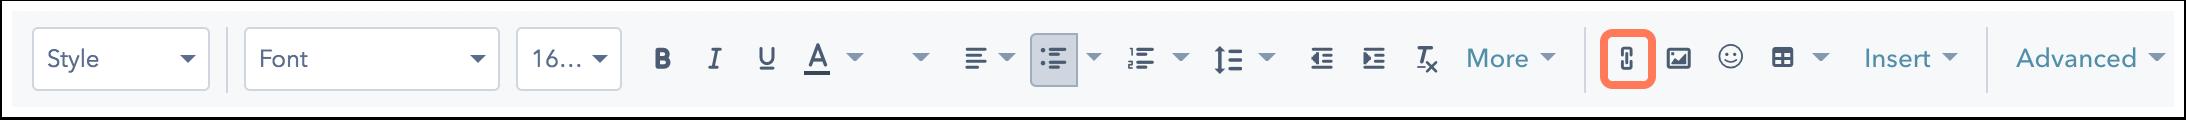 insert-link-icon